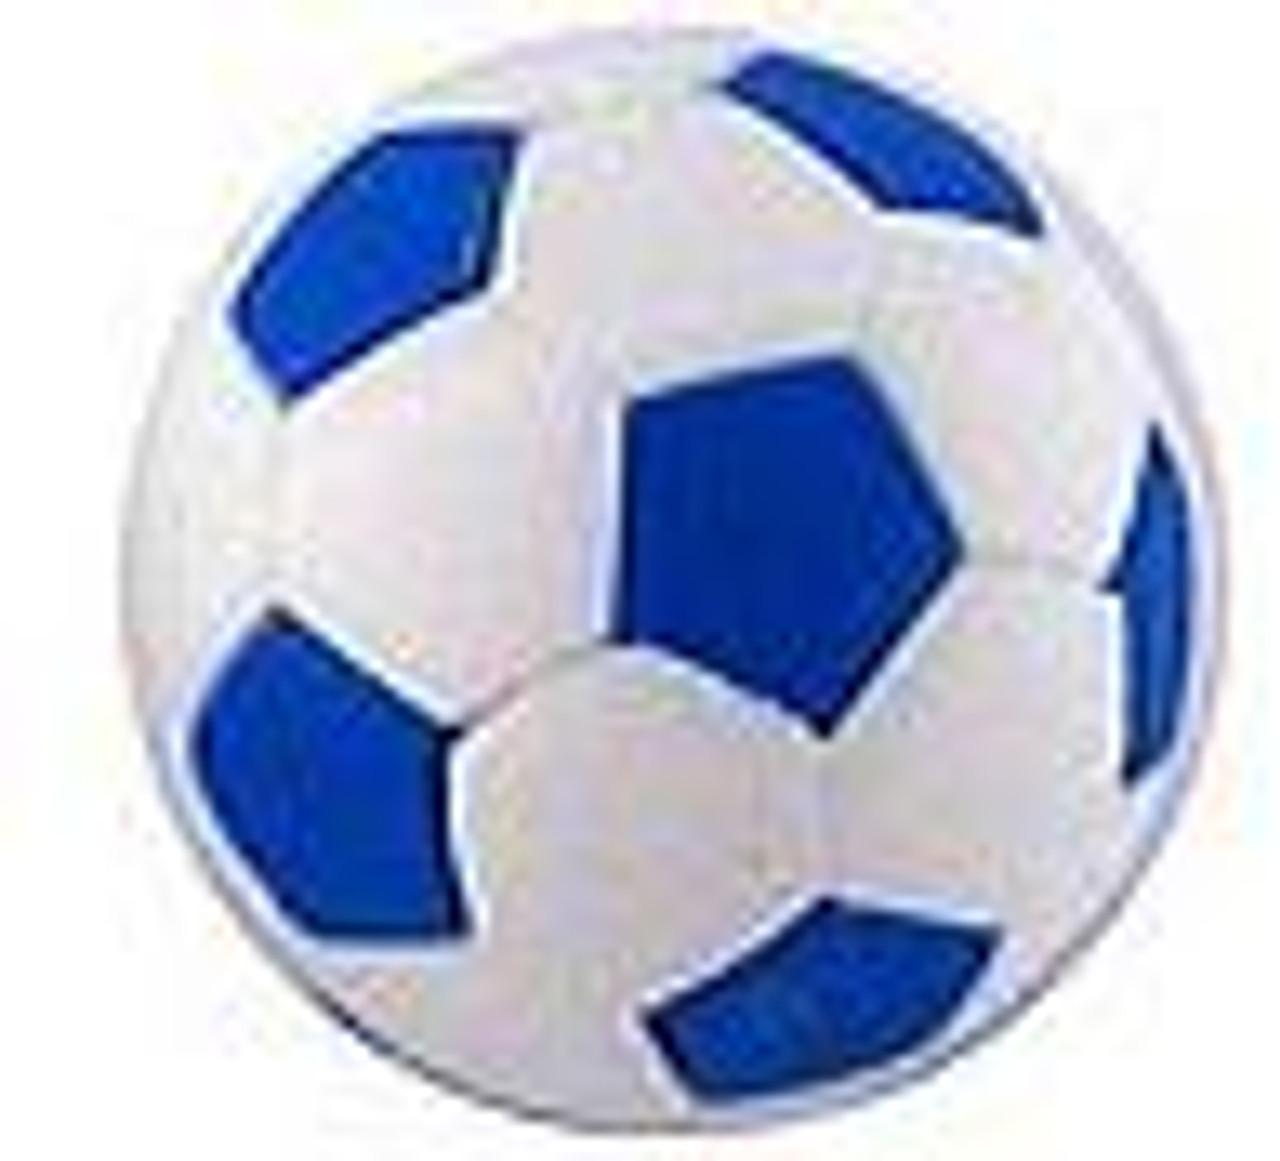 Iwako Blue Soccer Ball Eraser